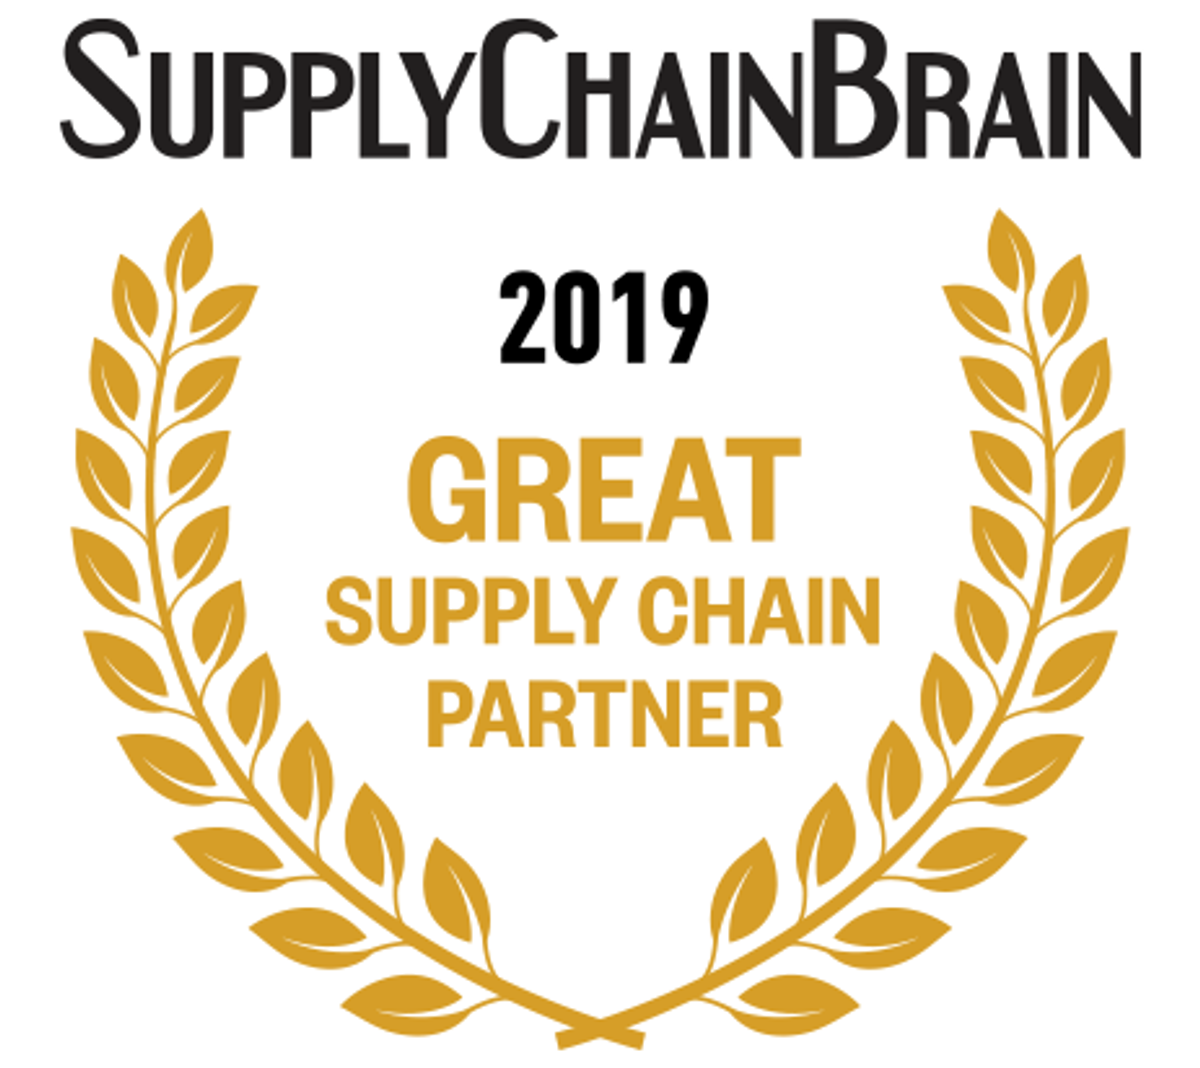 Penske Logistics Named Great Supply Chain Partner